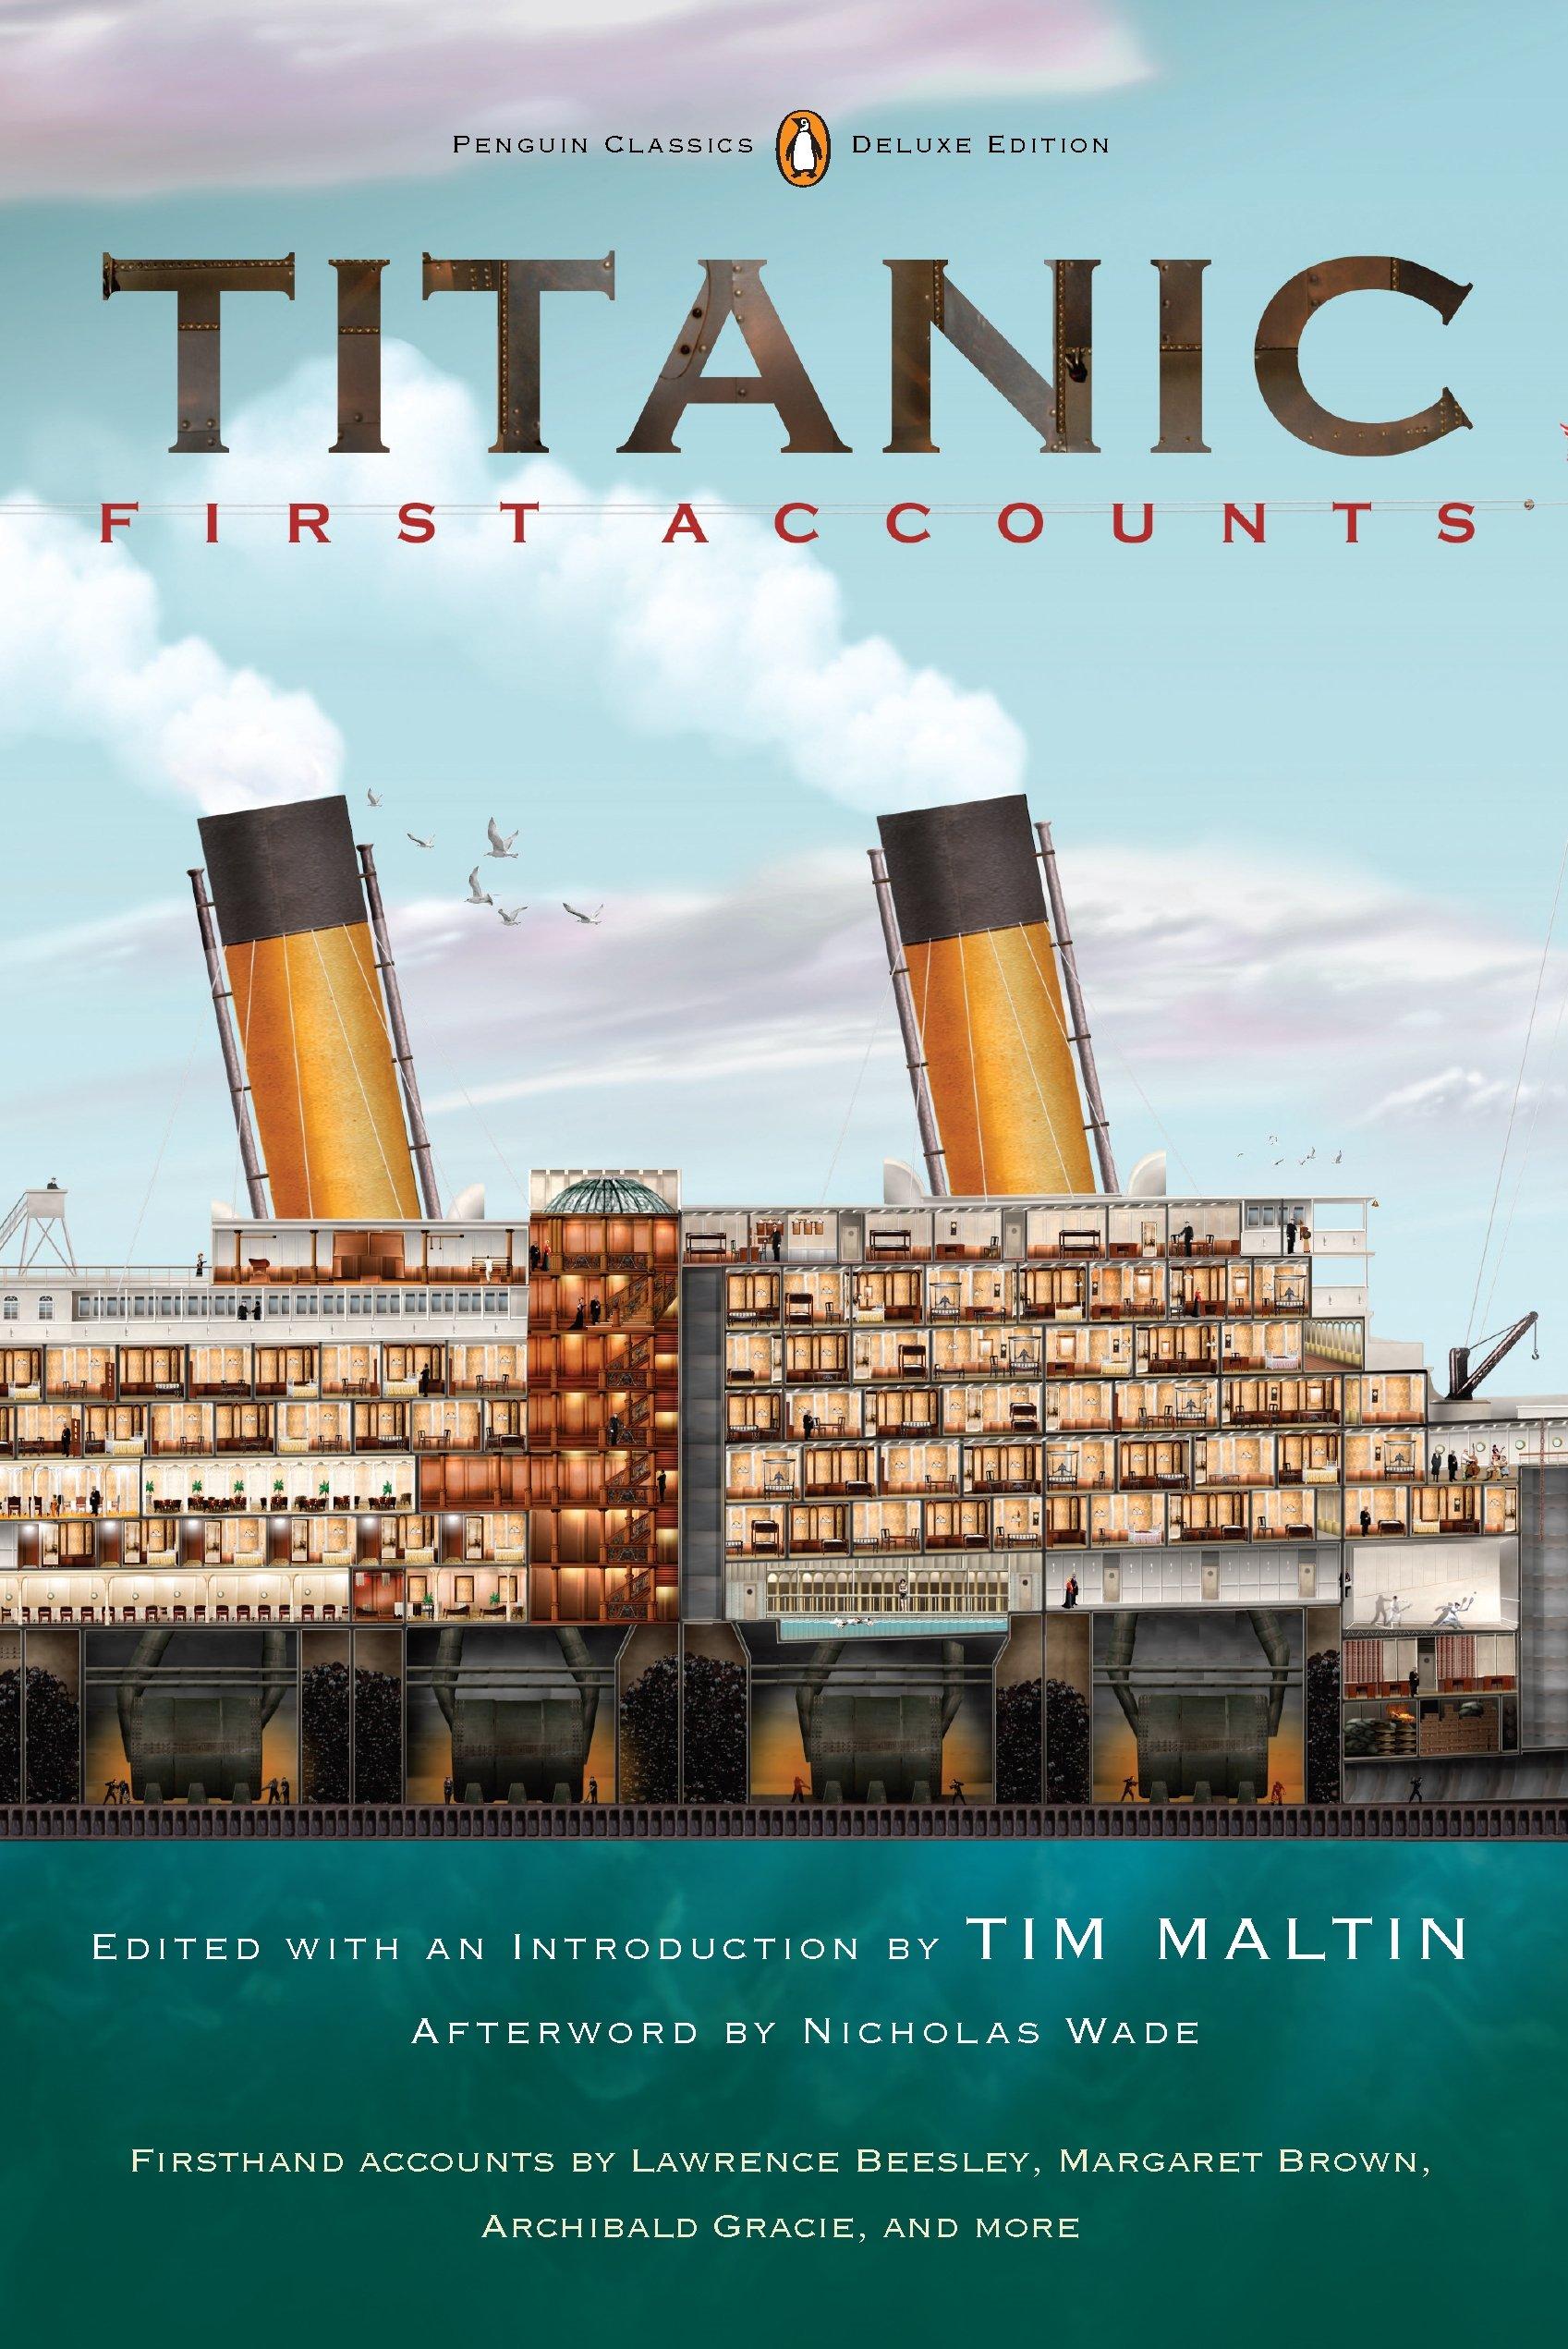 titanic-first-accounts-penguin-classics-deluxe-edition